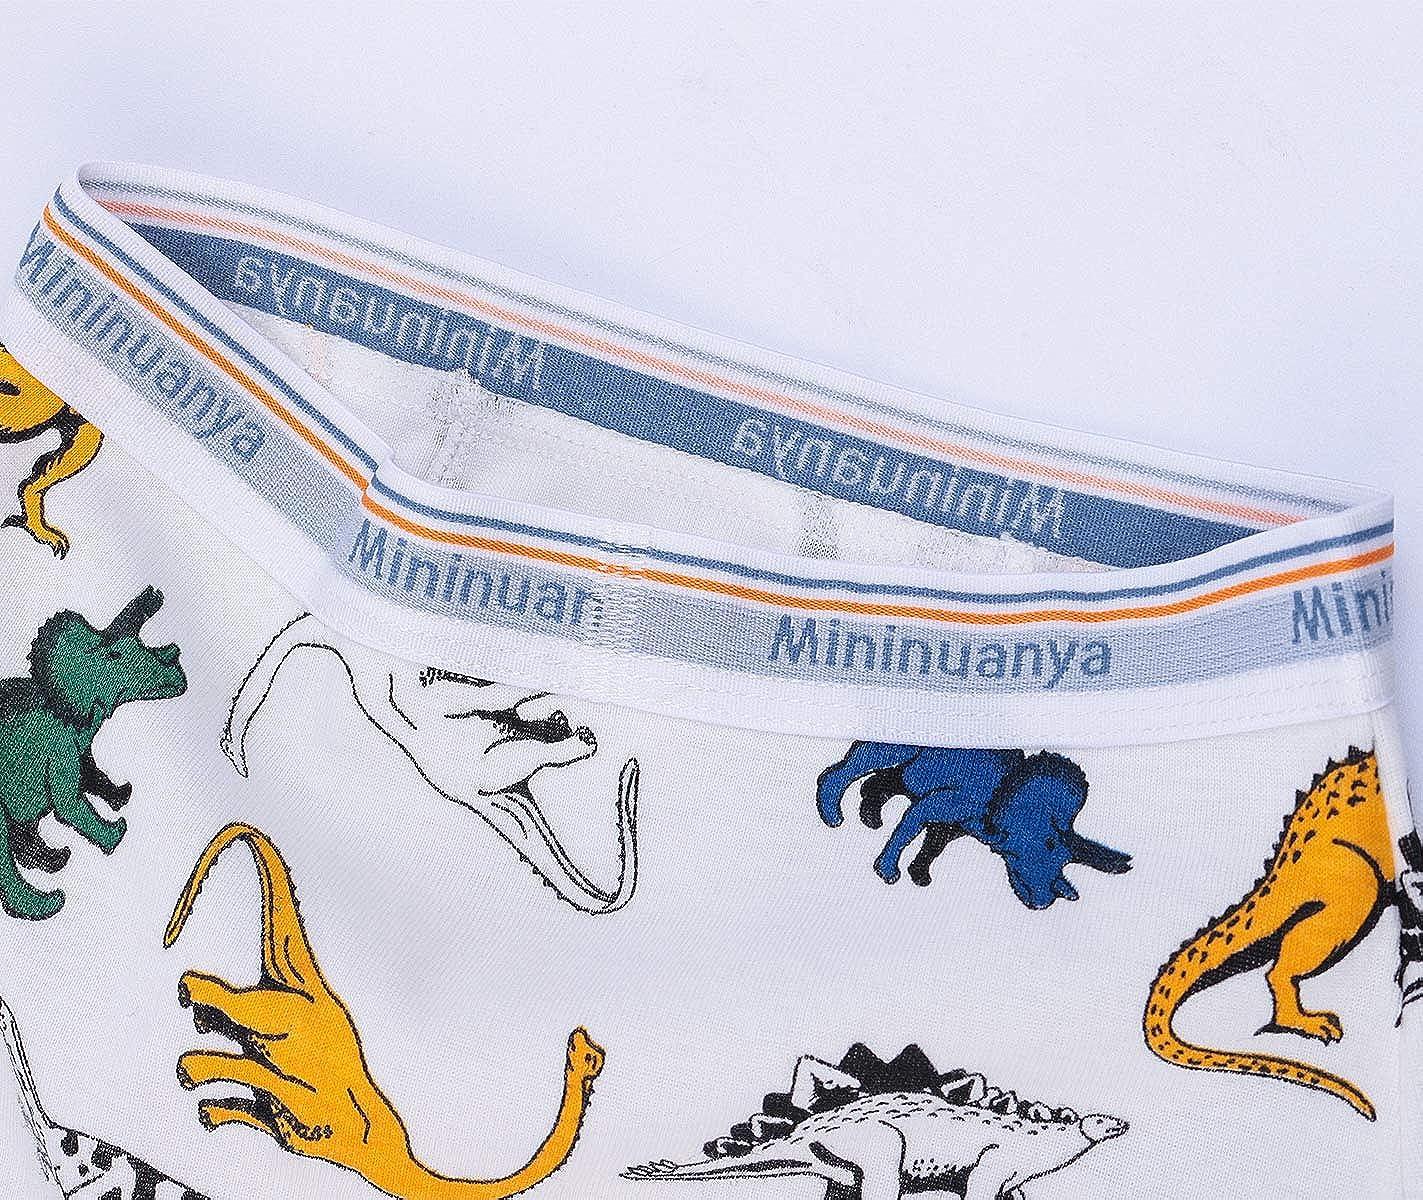 Auranso Dinosaur Truck Boys Pants 6 Pack Toddler Boys Underwear Briefs Kids Cotton Underpants 2-8 Years